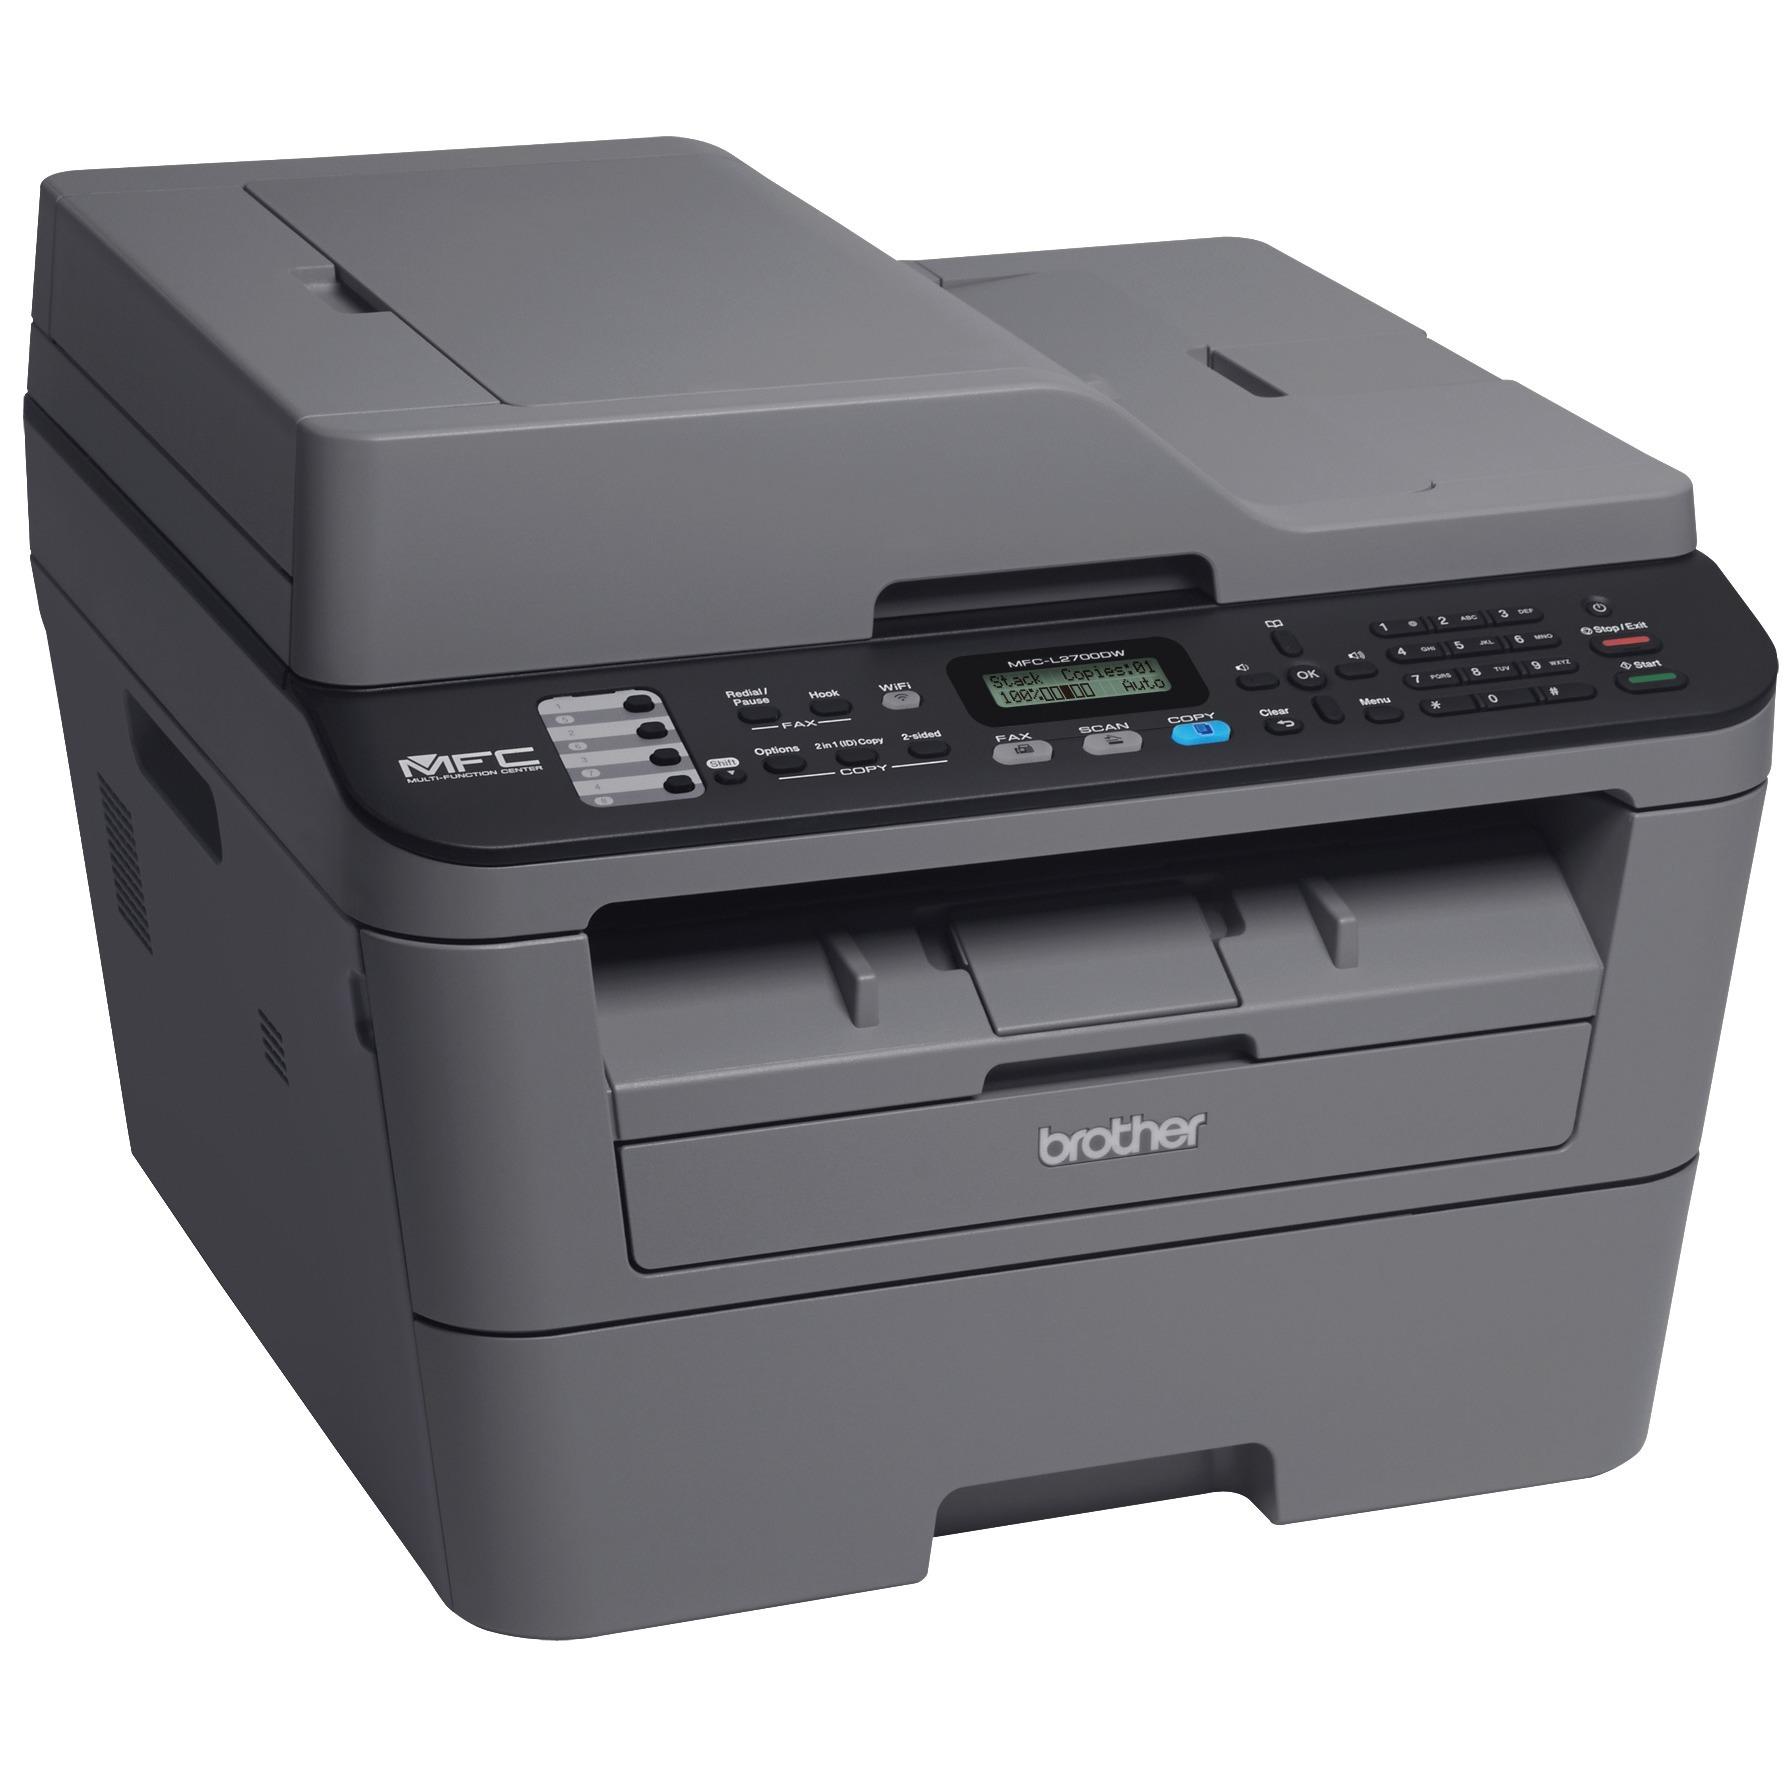 Brother MFC MFC-L2700DW Laser Multifunction Printer - Monochrome - Plain Paper Print - Desktop